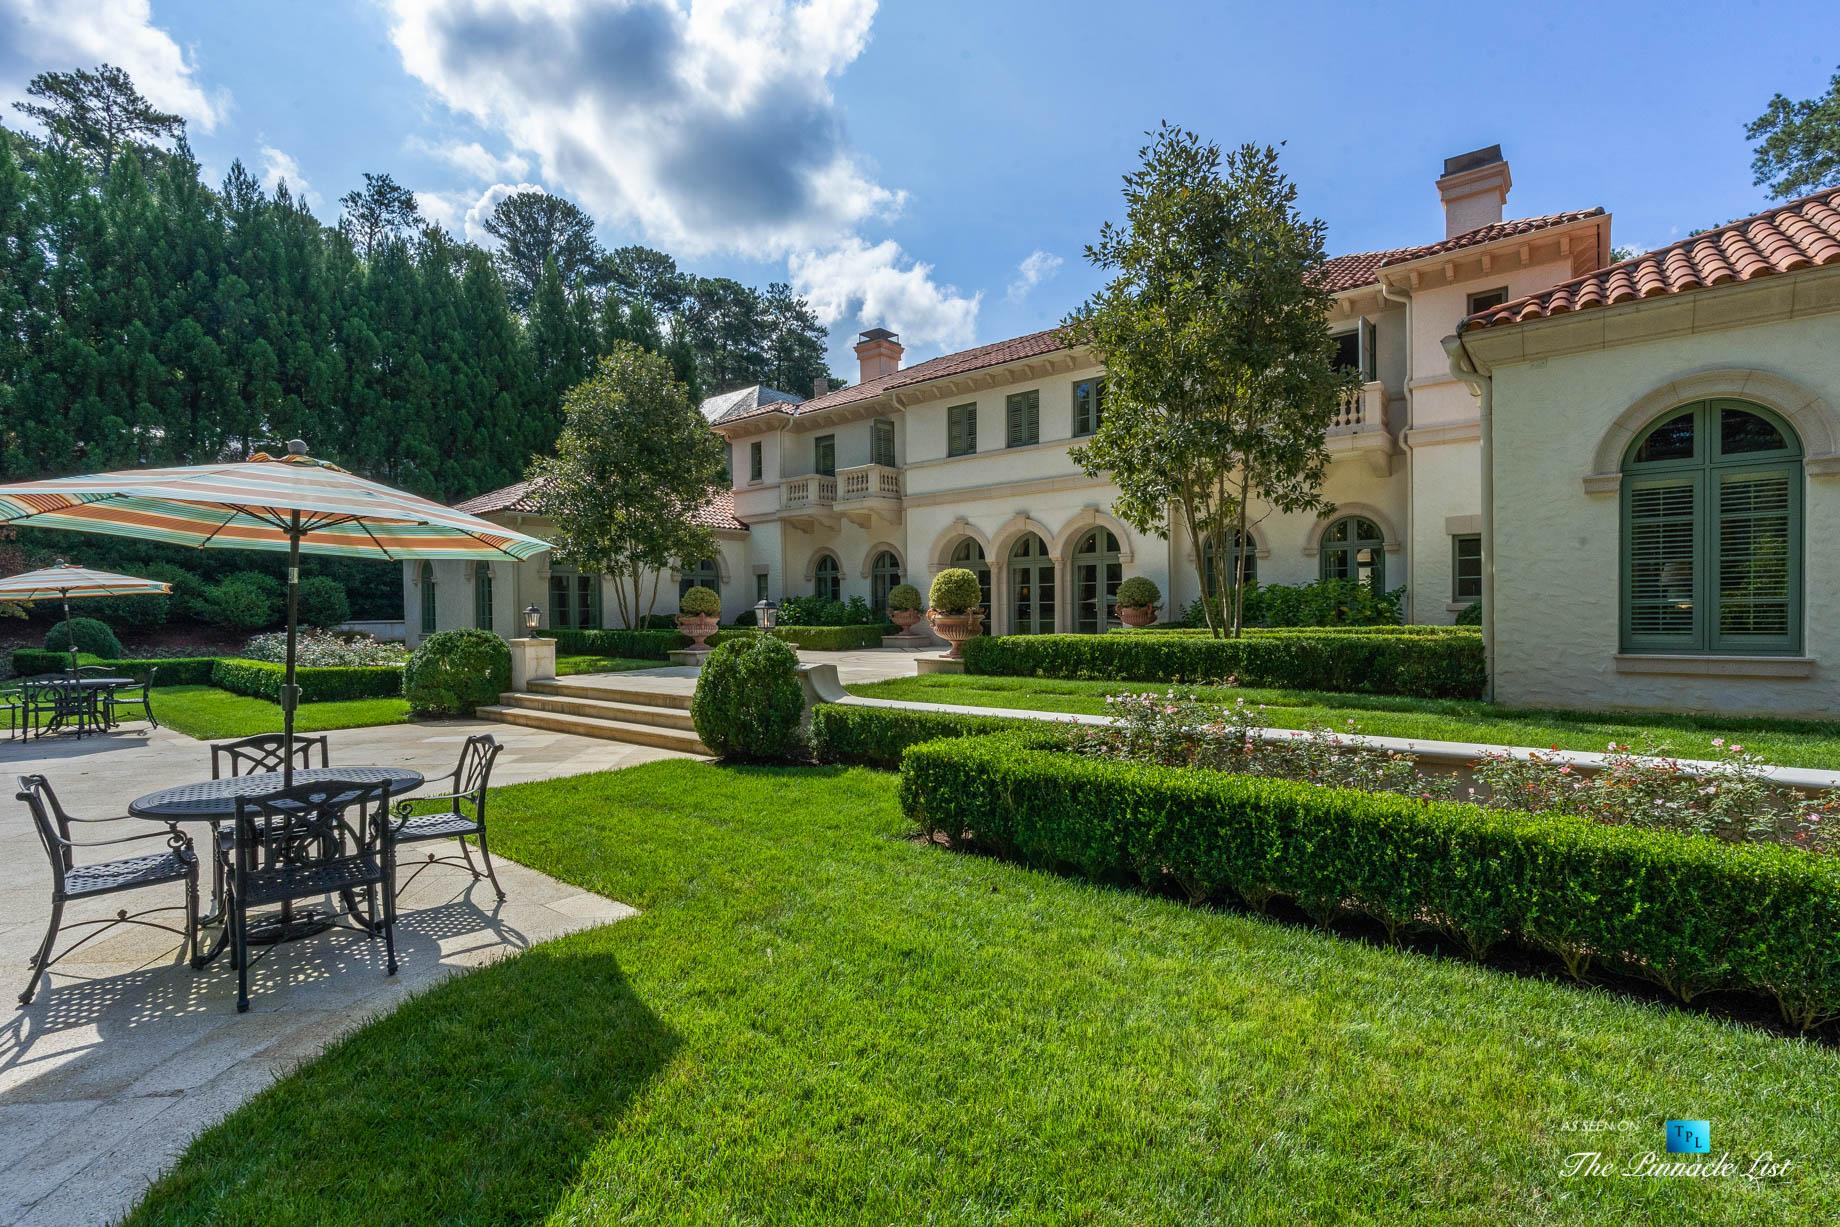 439 Blackland Rd NW, Atlanta, GA, USA – Property Backyard Landscaping Detail – Luxury Real Estate – Tuxedo Park Mediterranean Mansion Home